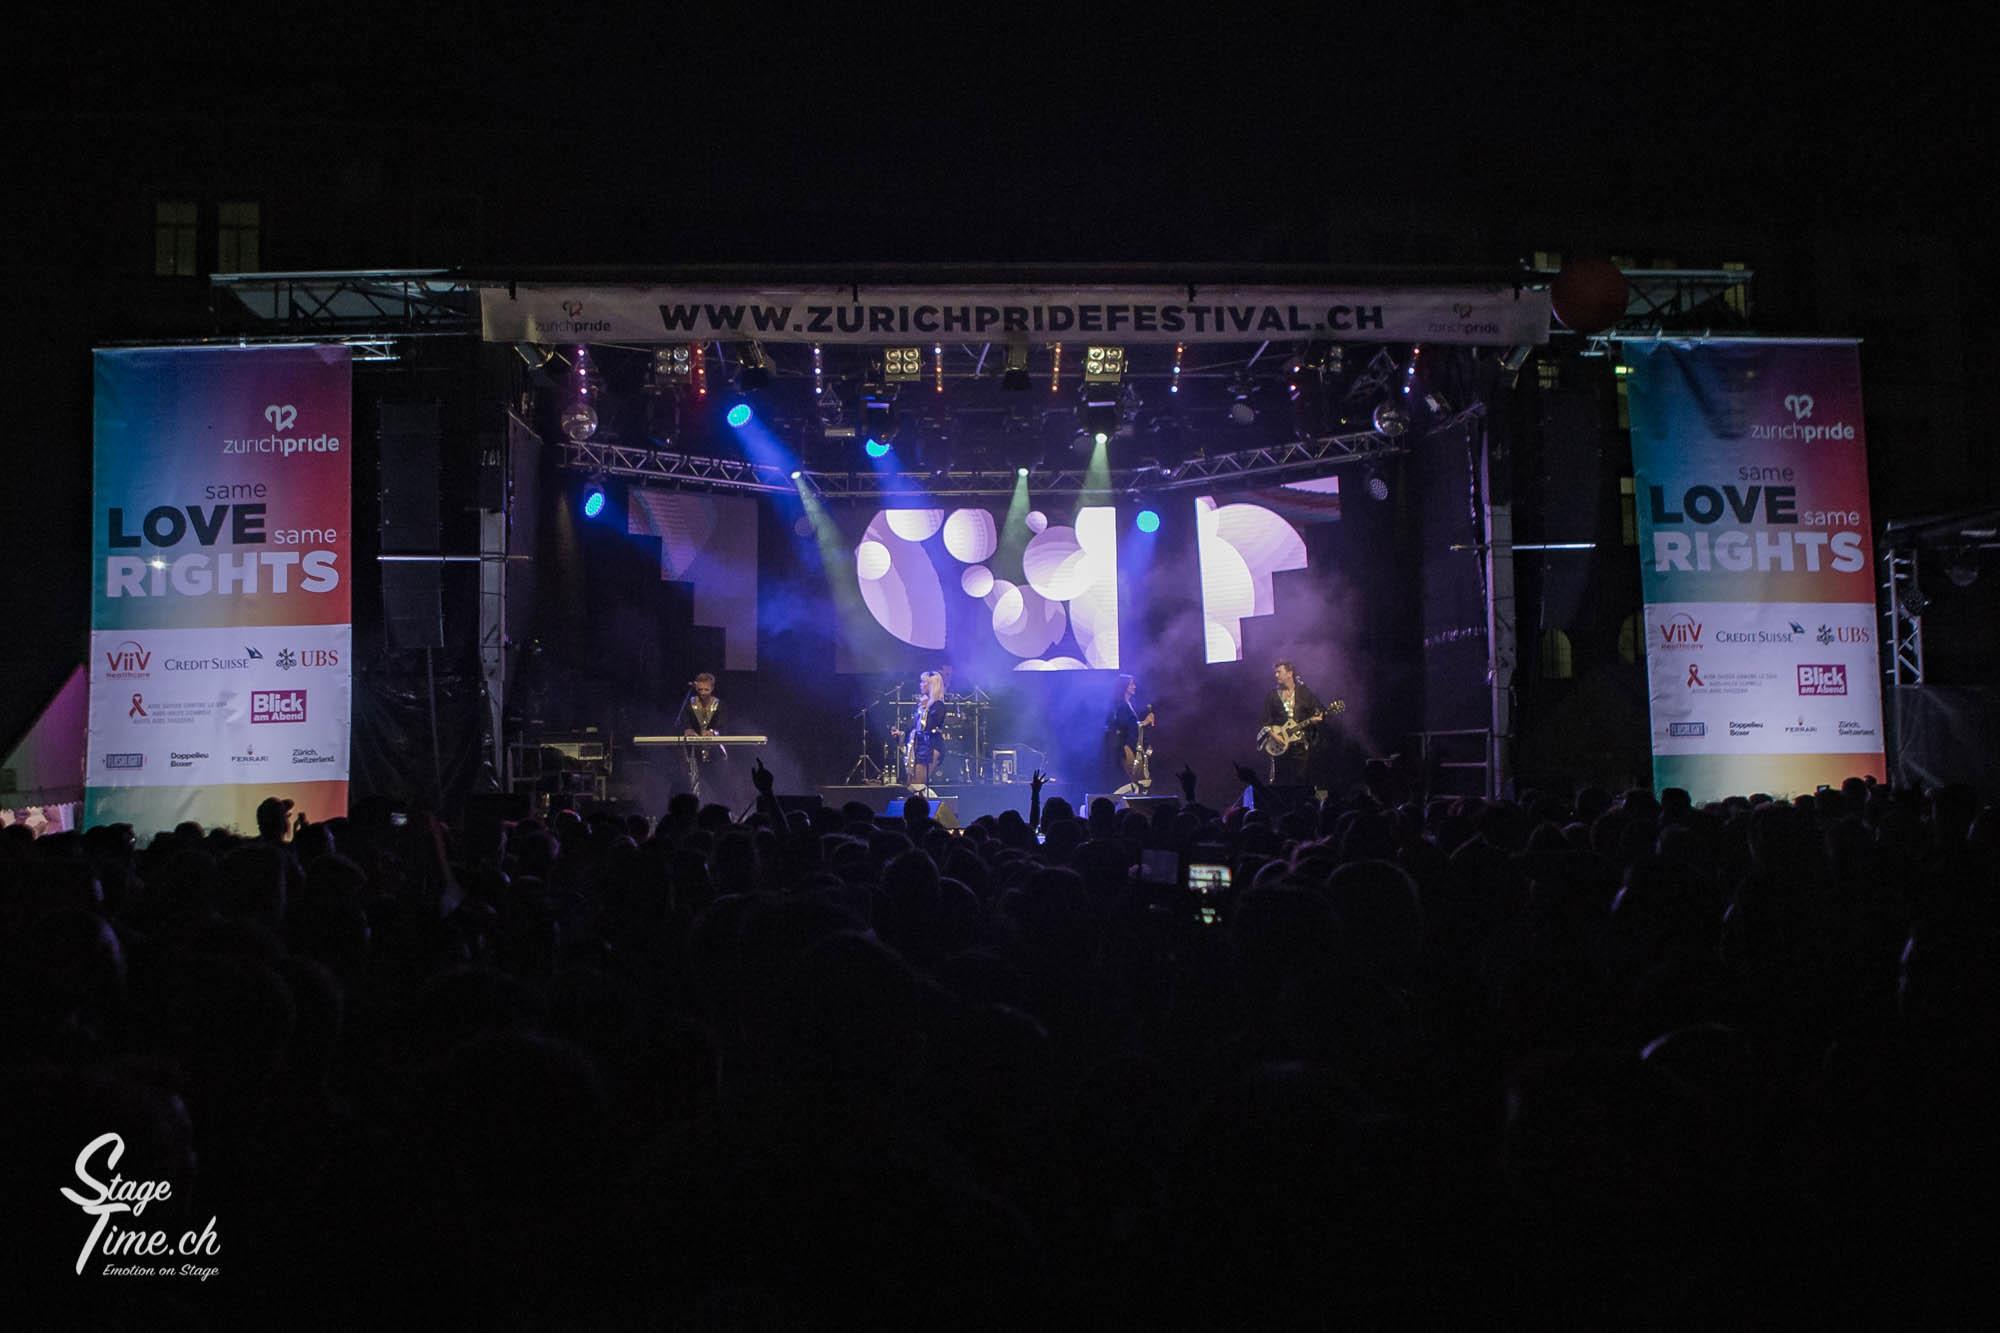 Zurich_Pride_Festival_2018___📷_Christoph_Gurtner___stagetime.ch-57